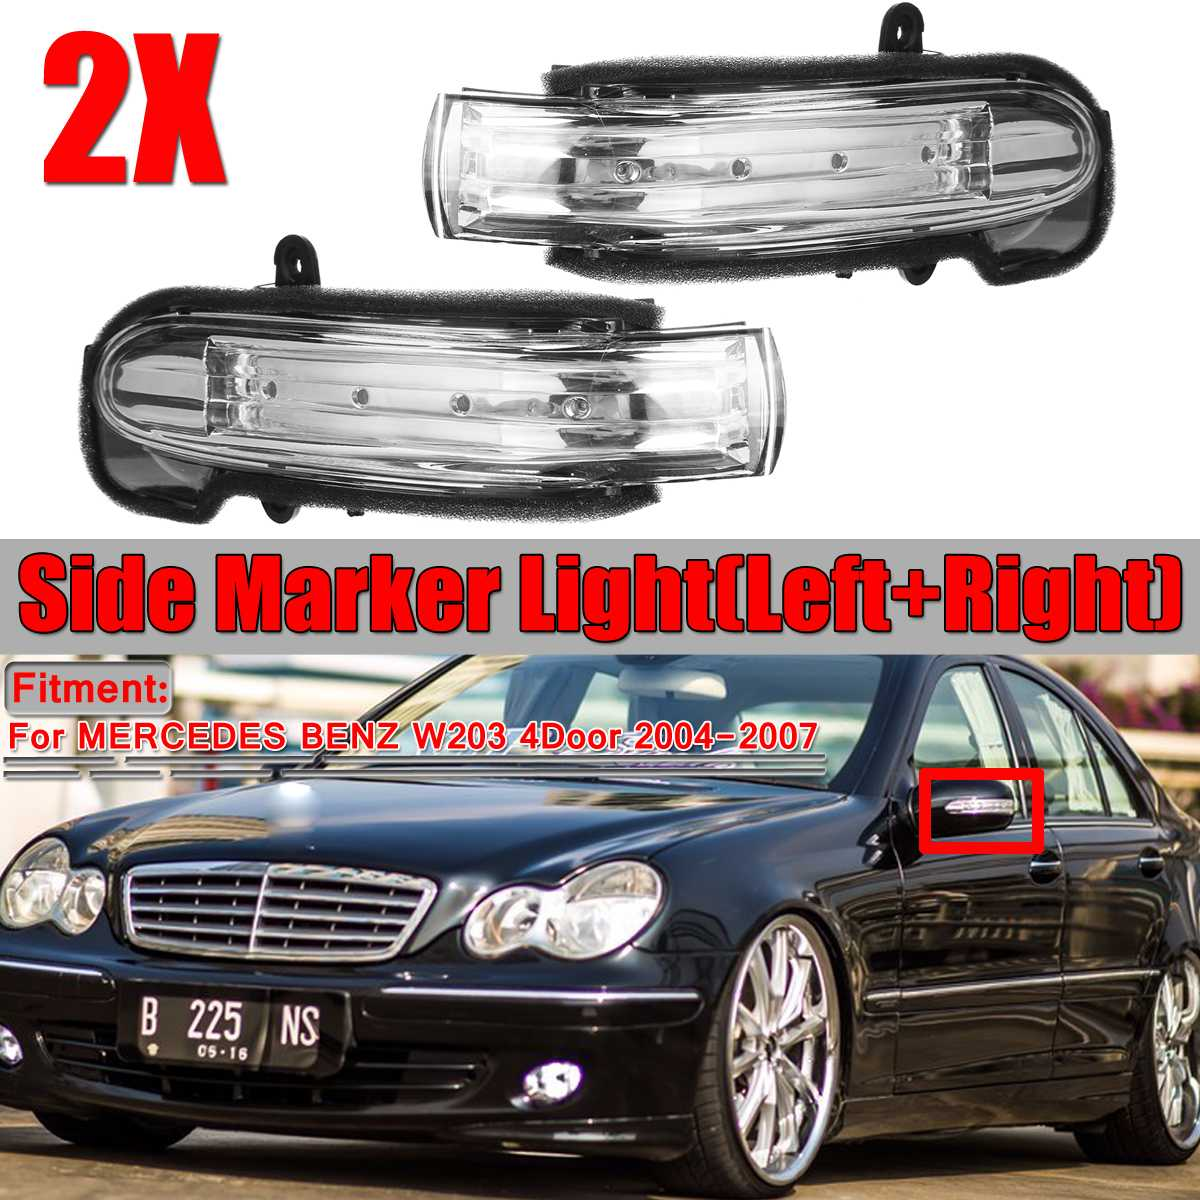 Car Side Marker Light Door Wing Rearview Mirror Turn Signal Indicator Side Light Lamp For Mercedes For Benz W203 4Door 2004-2007